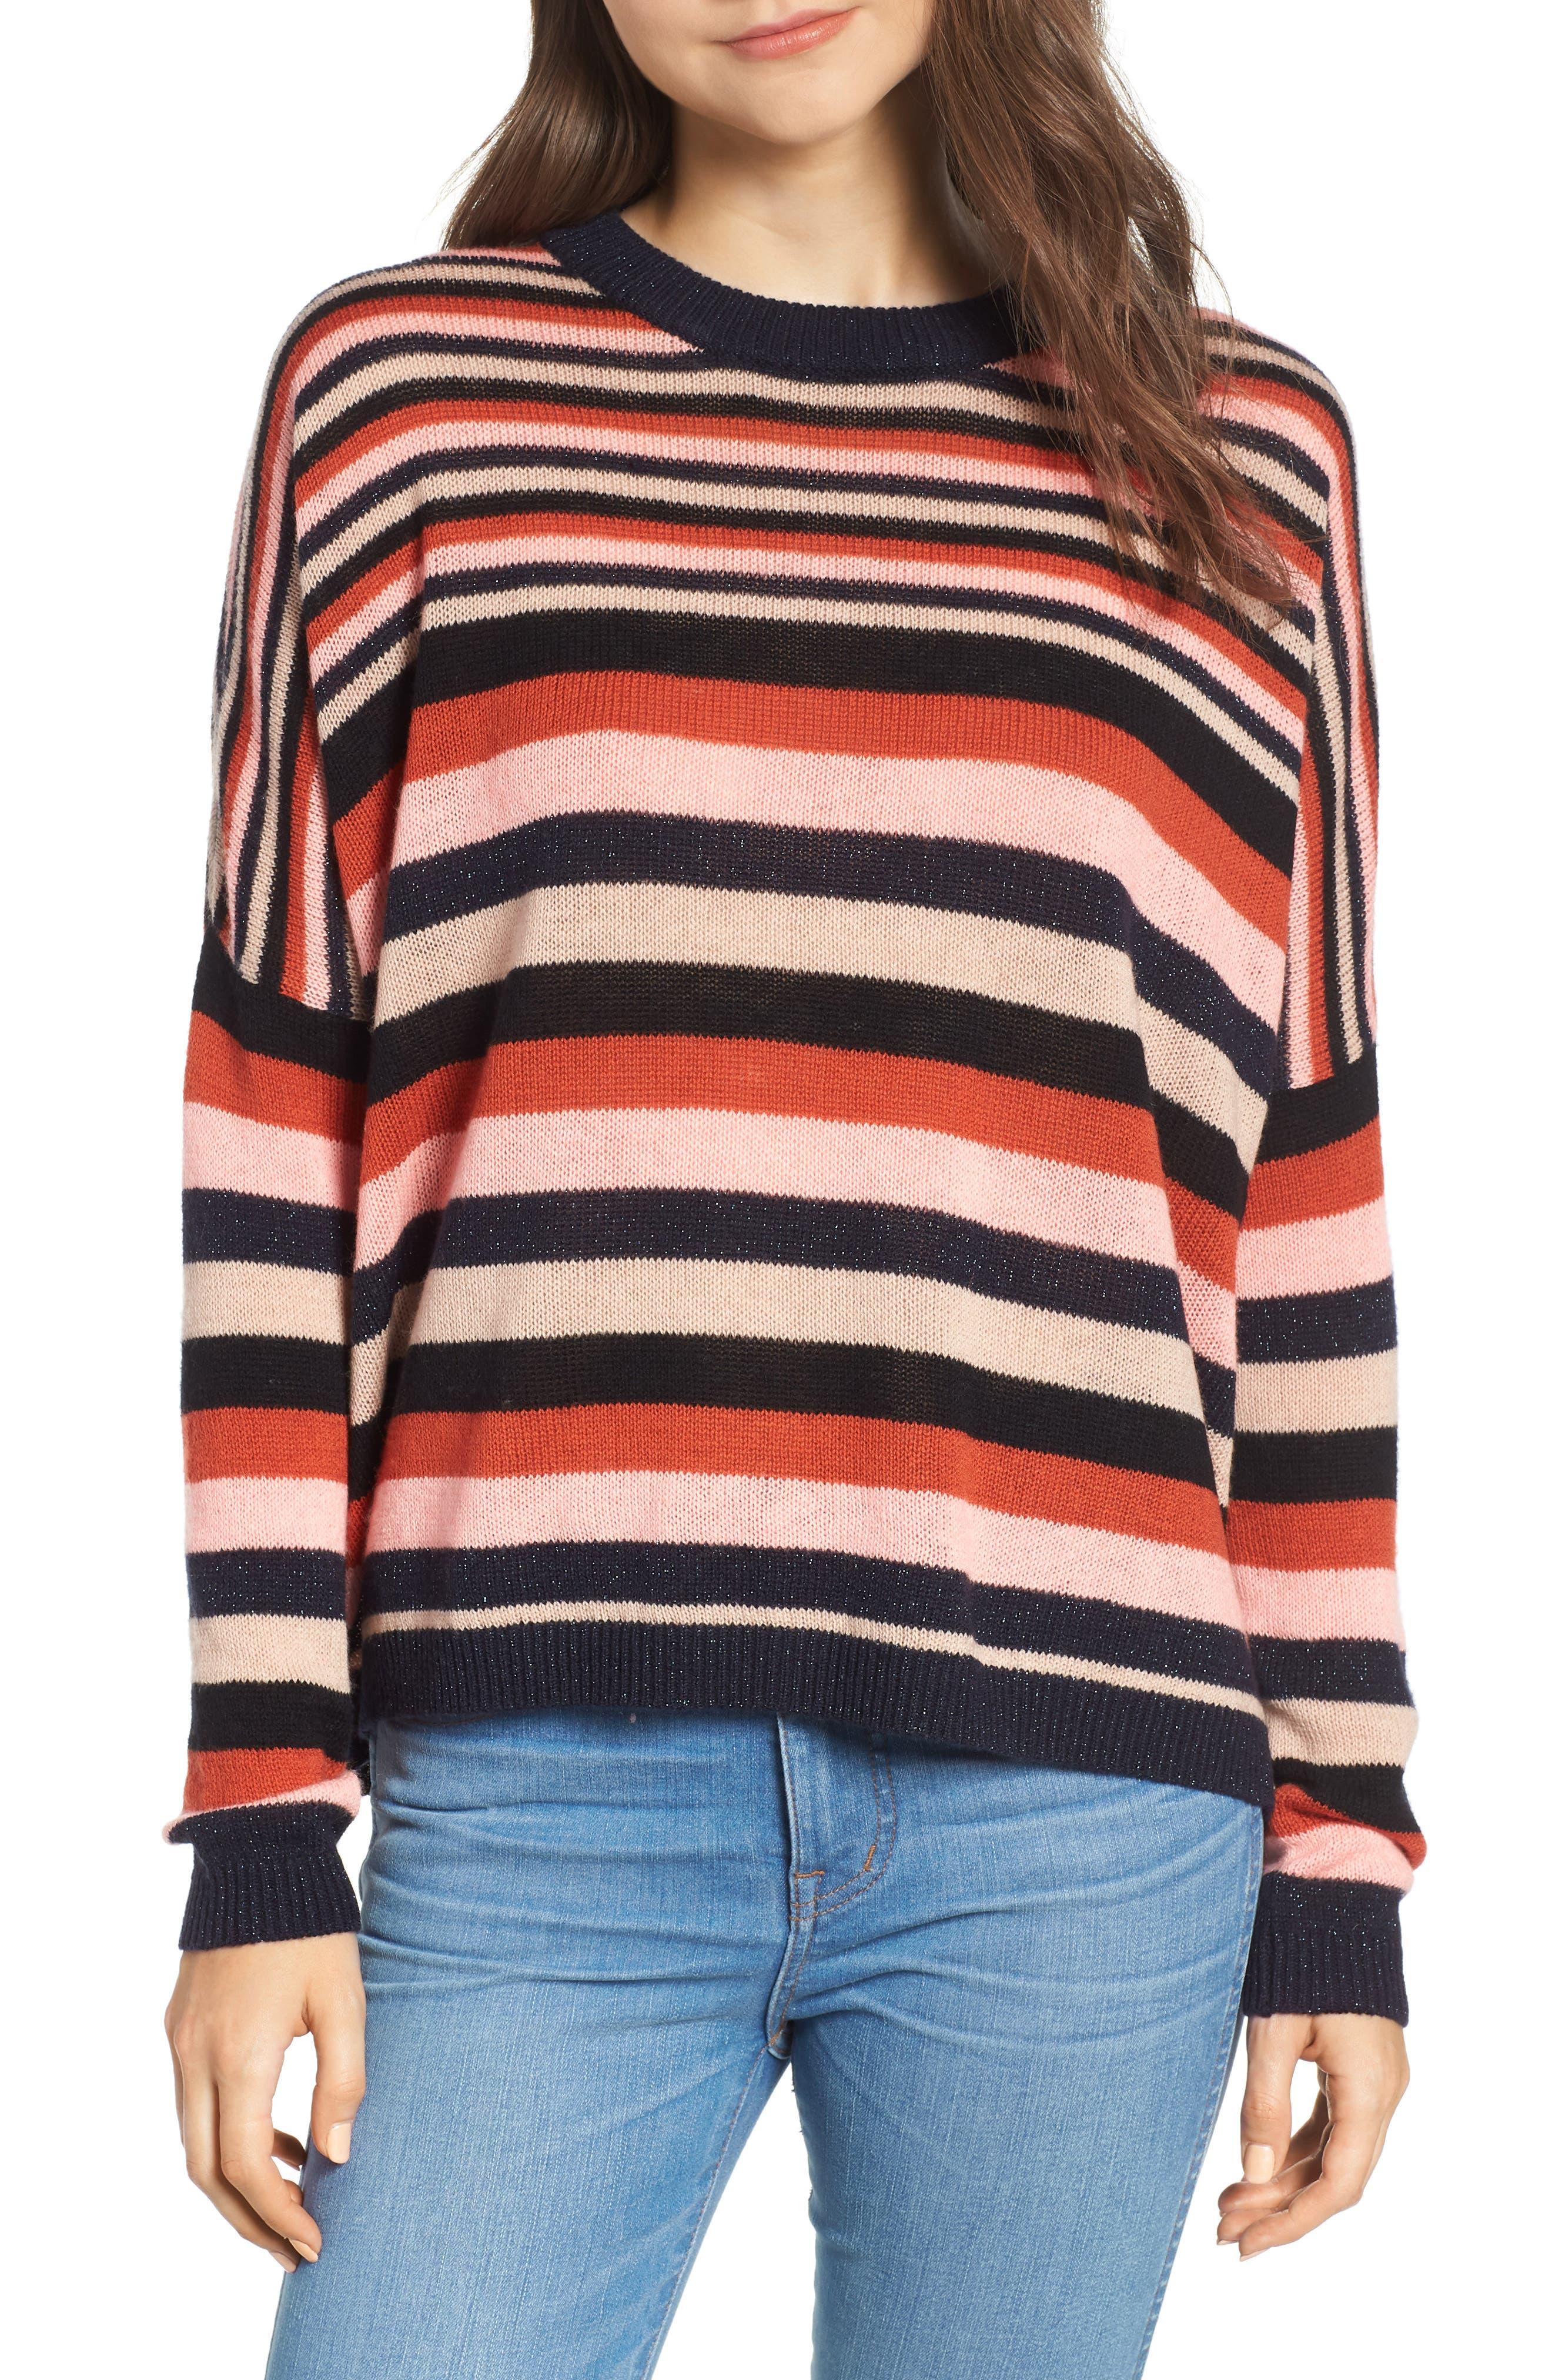 SCOTCH & SODA Stripe Sweater, Main, color, 651